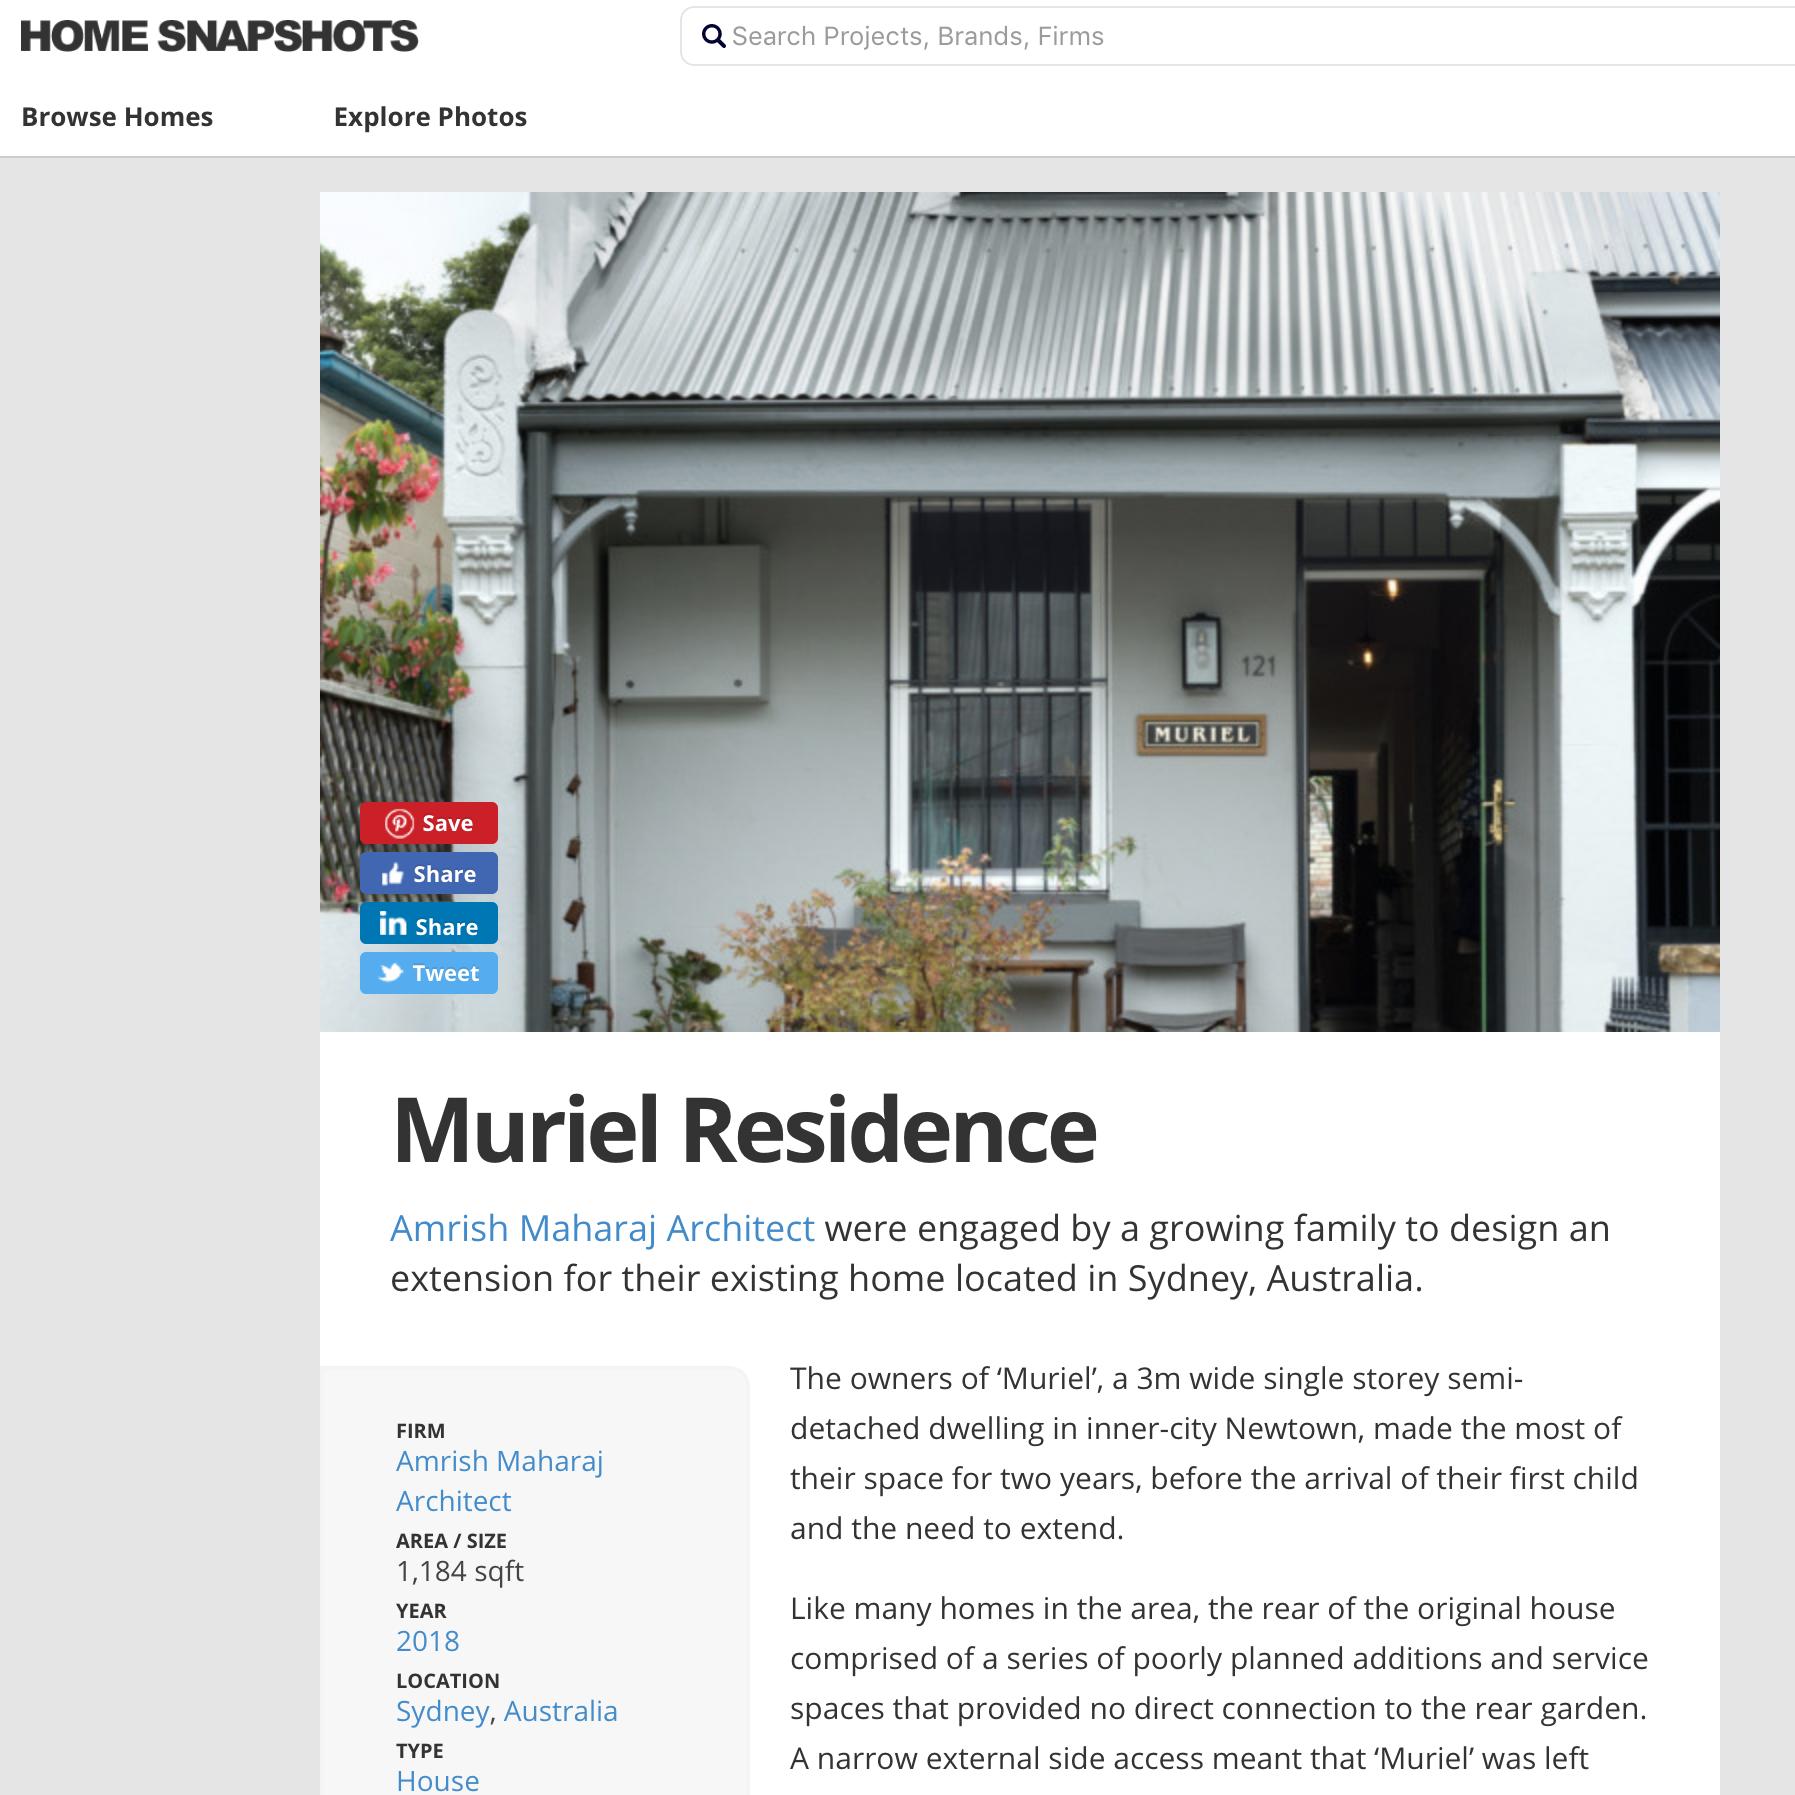 Muriel / Home Snapshot